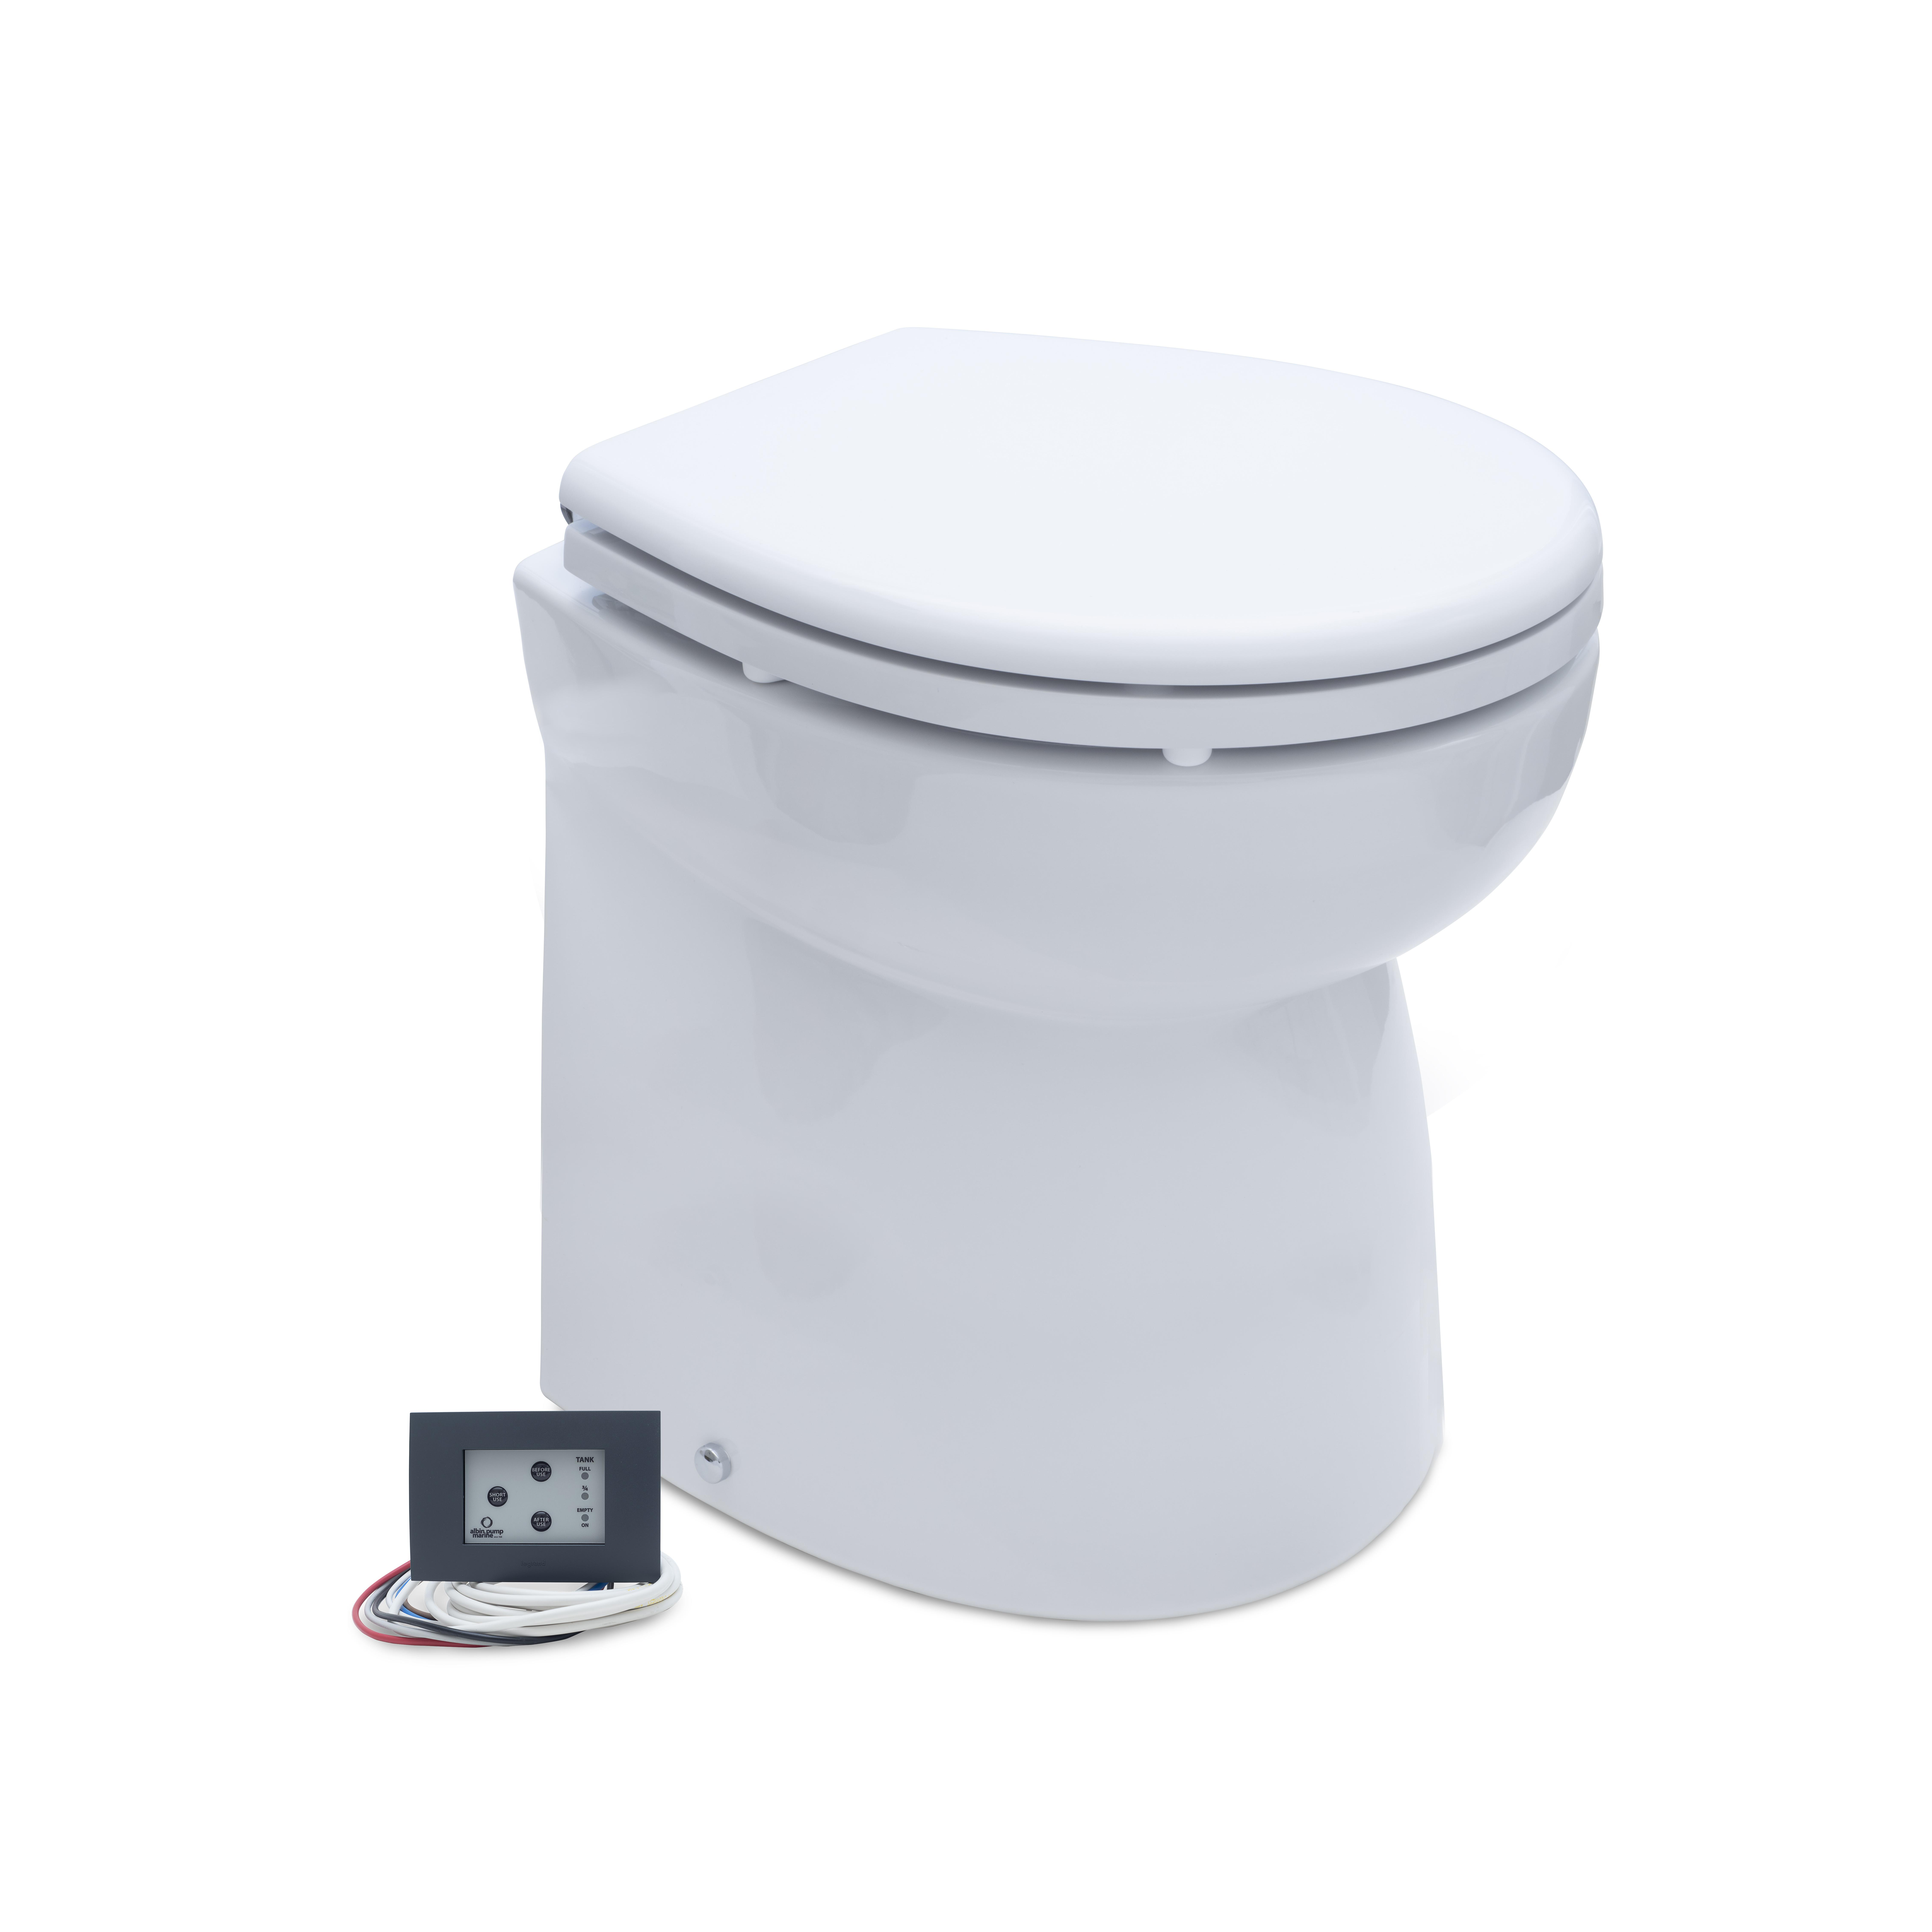 Albin Pump Bordtoilette elektrisch Premium 12V